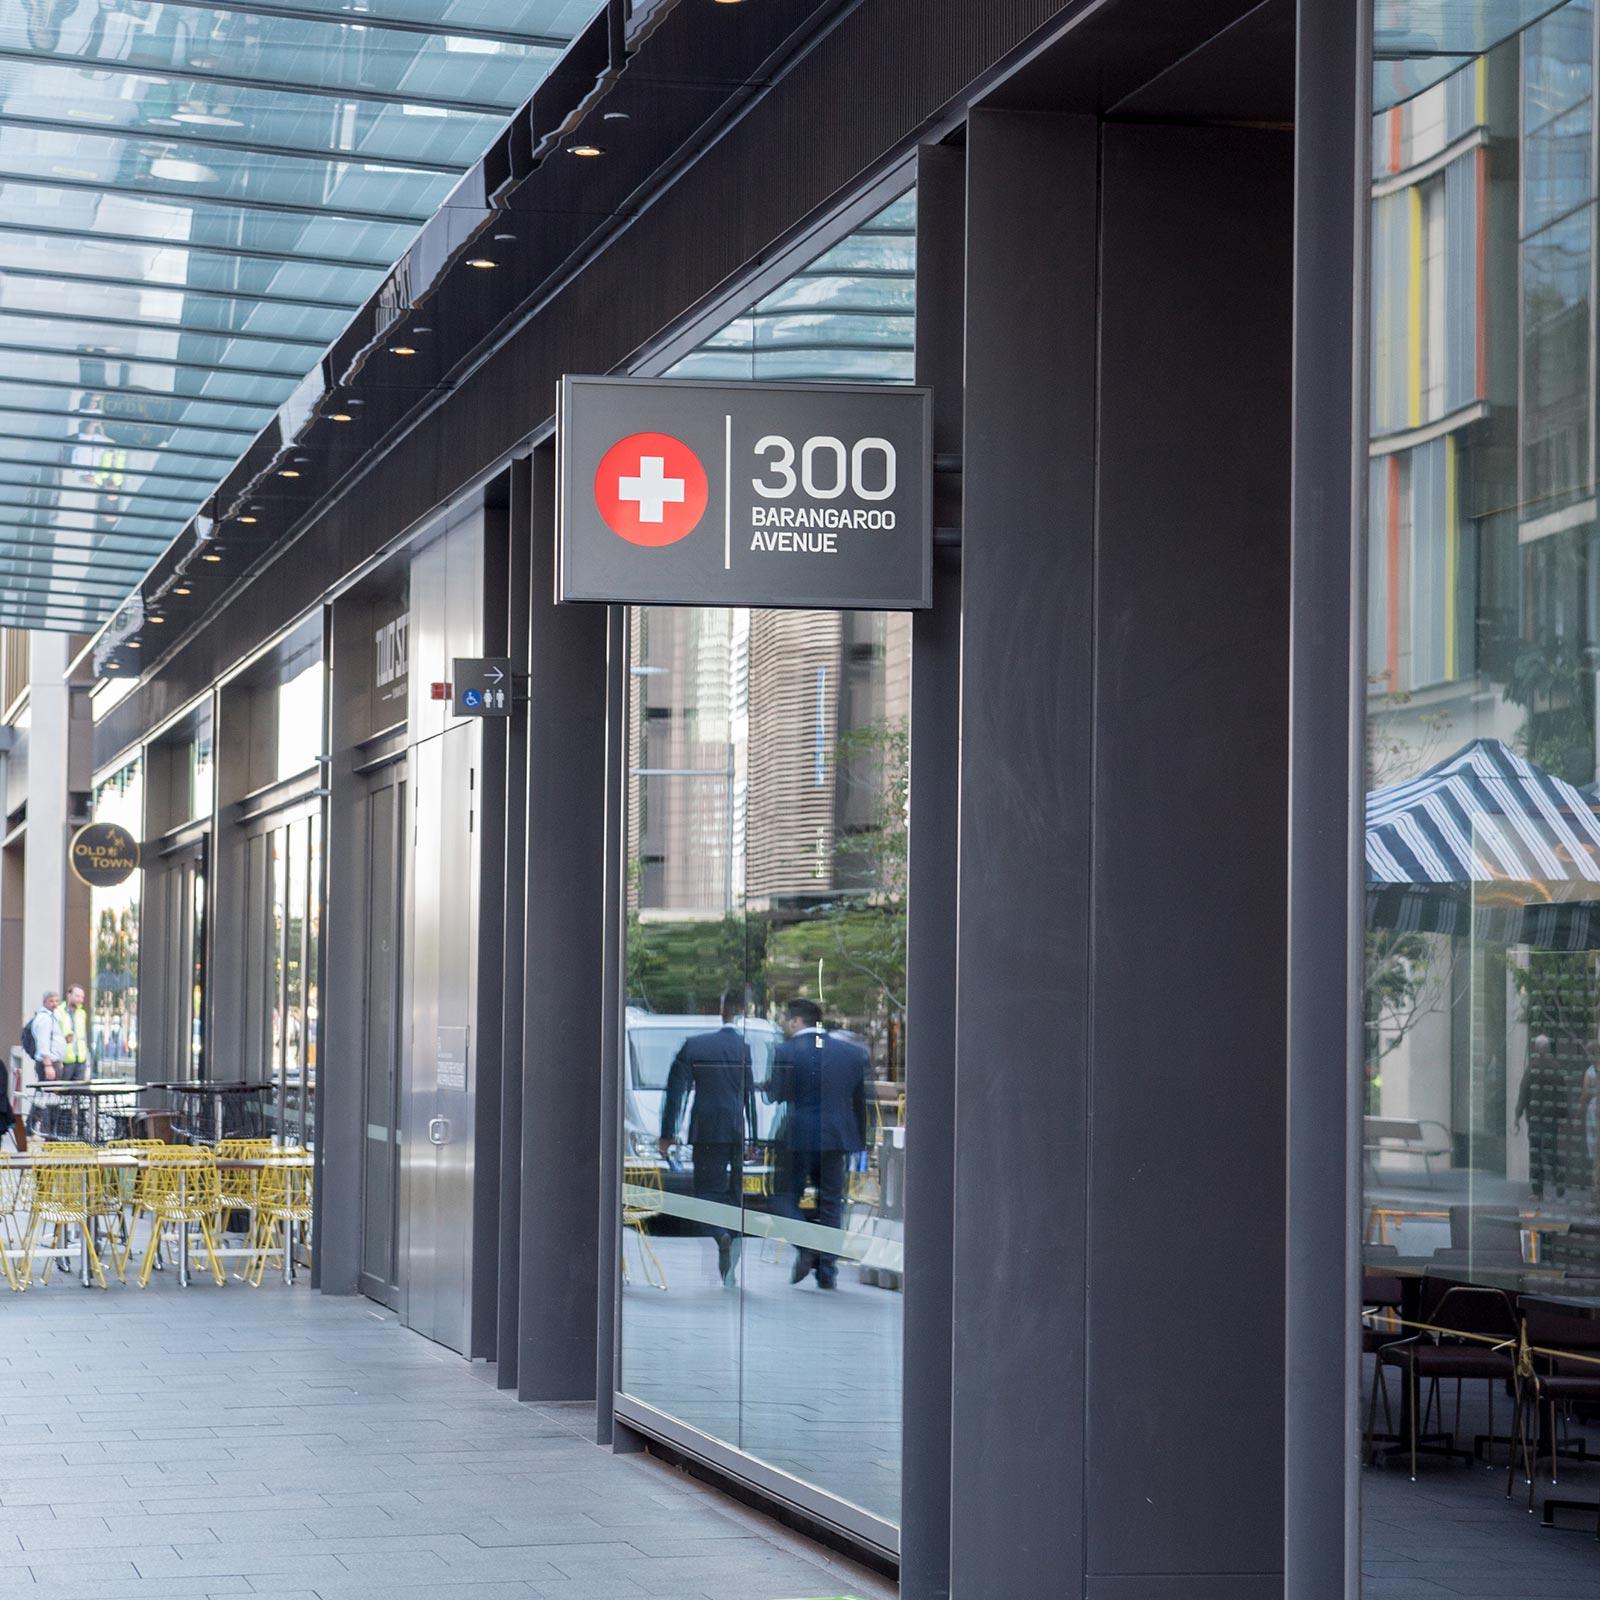 300 barangaroo avenue